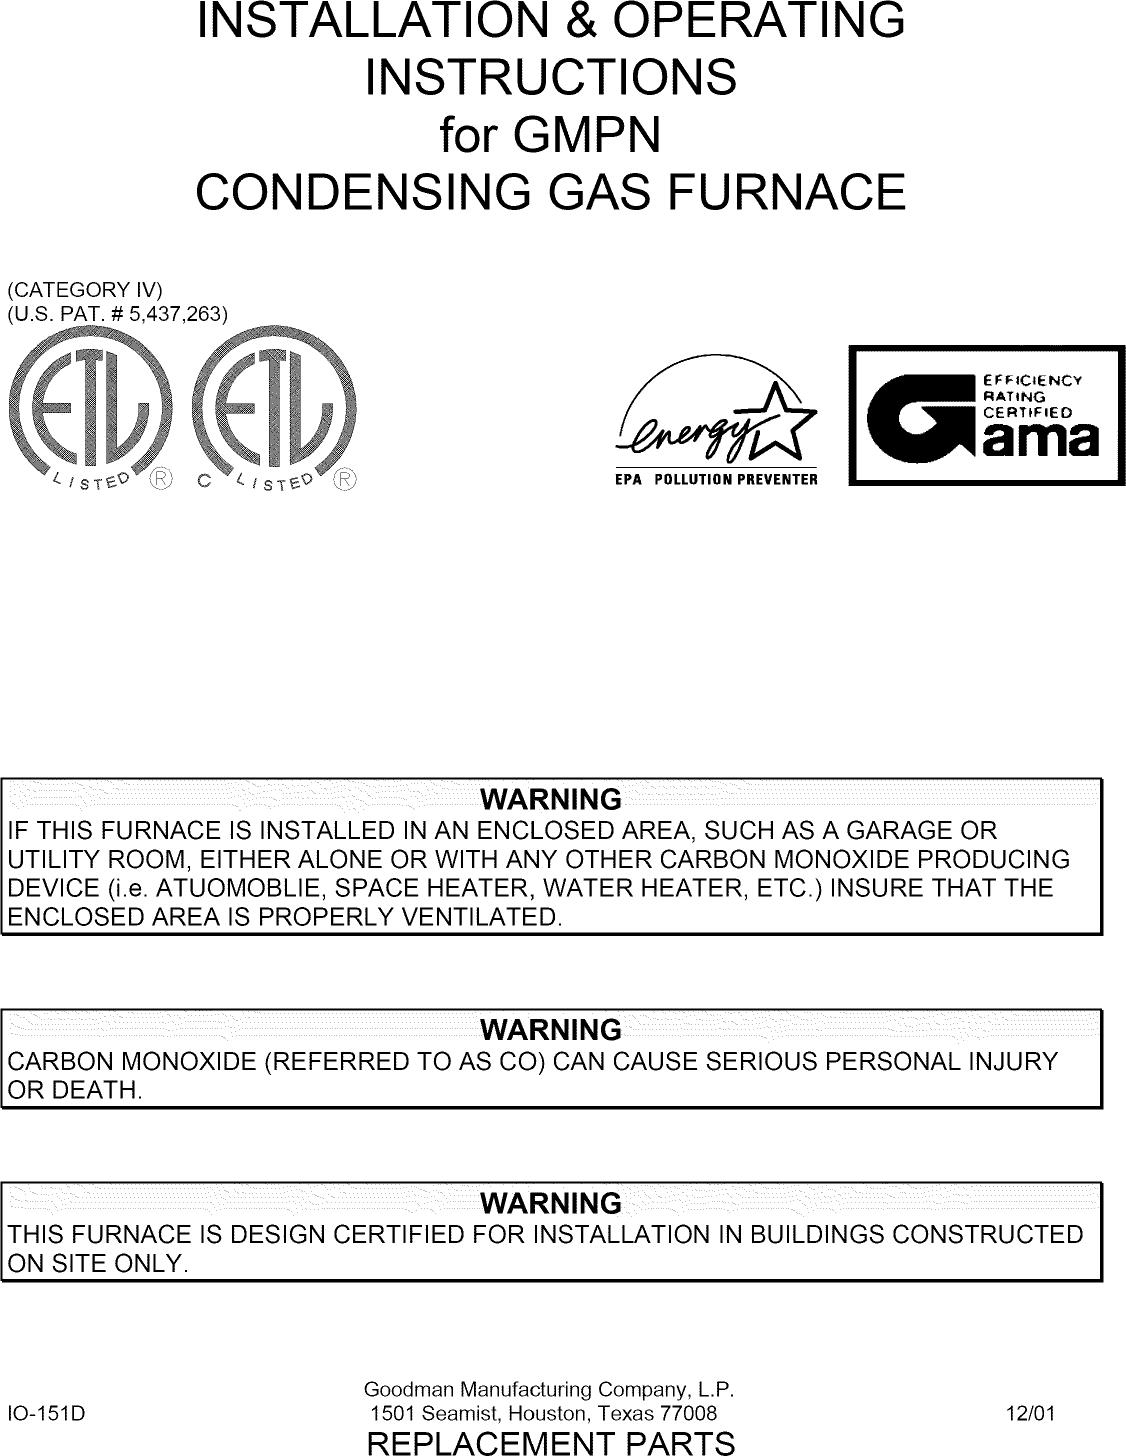 Goodman Gmpn040 3 User Manual Gas Furnace Manuals And Manual Guide